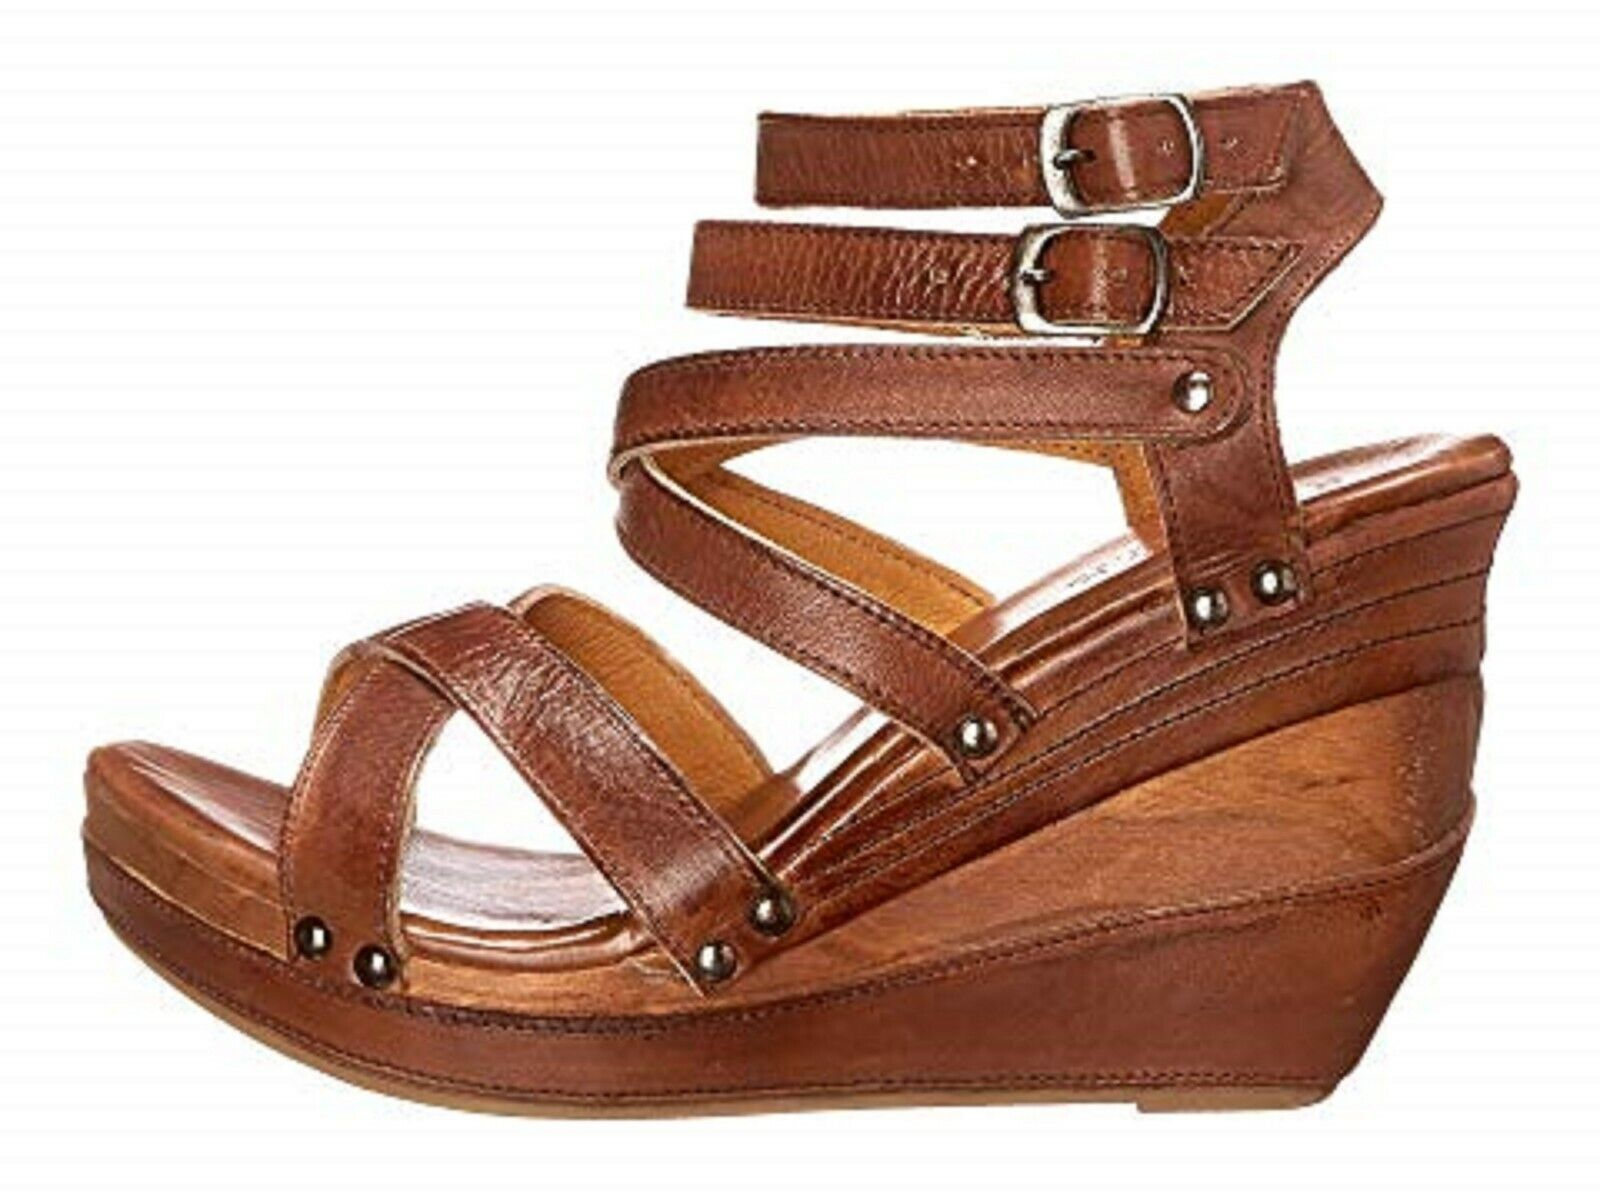 1Bed Stu Juliana Wedge Platform Sandals Women's Size 9.5 Tan Rustic BEDSTU BROWN